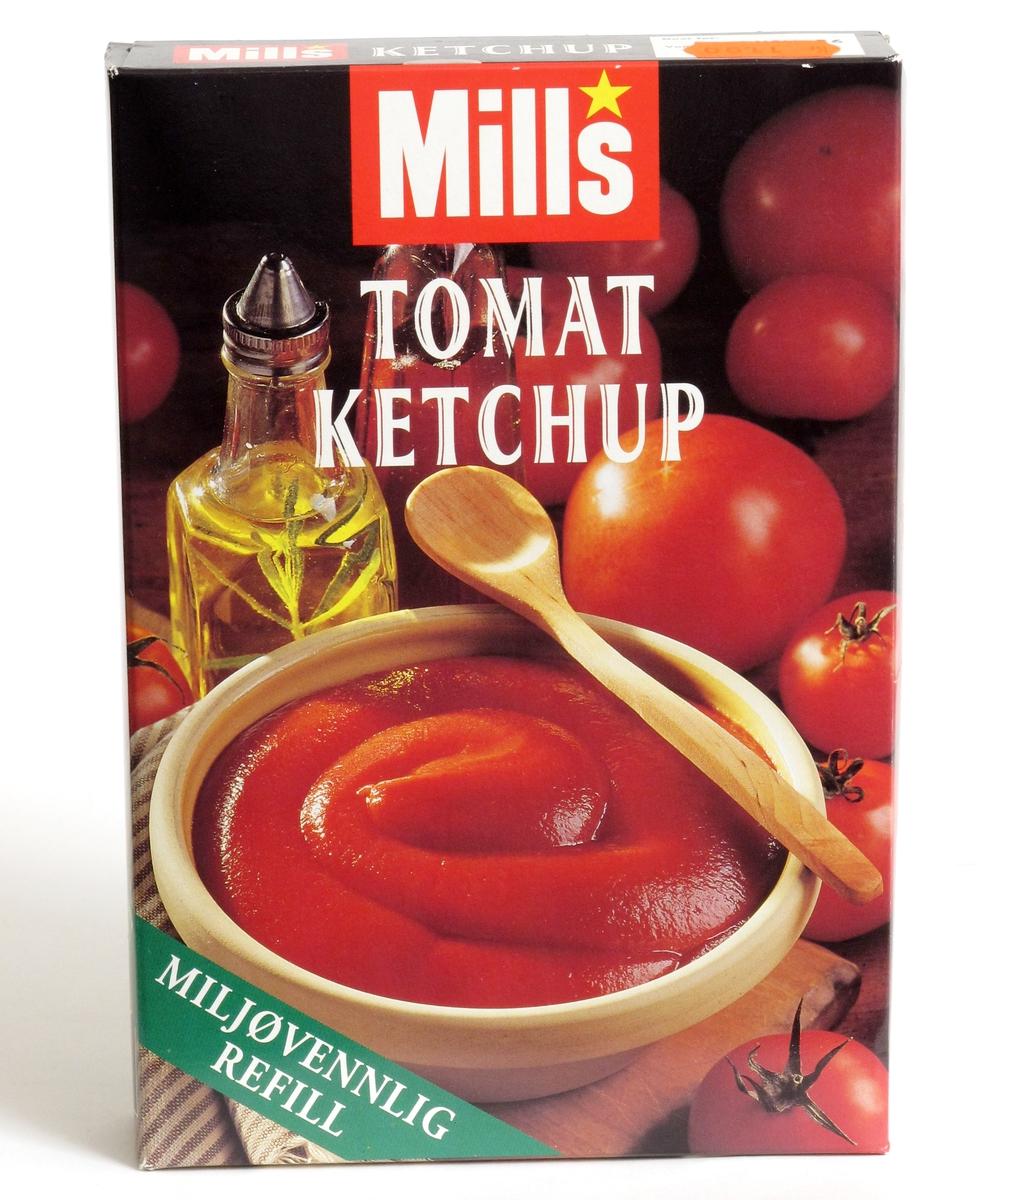 Tomater, tomatketchup og olje.